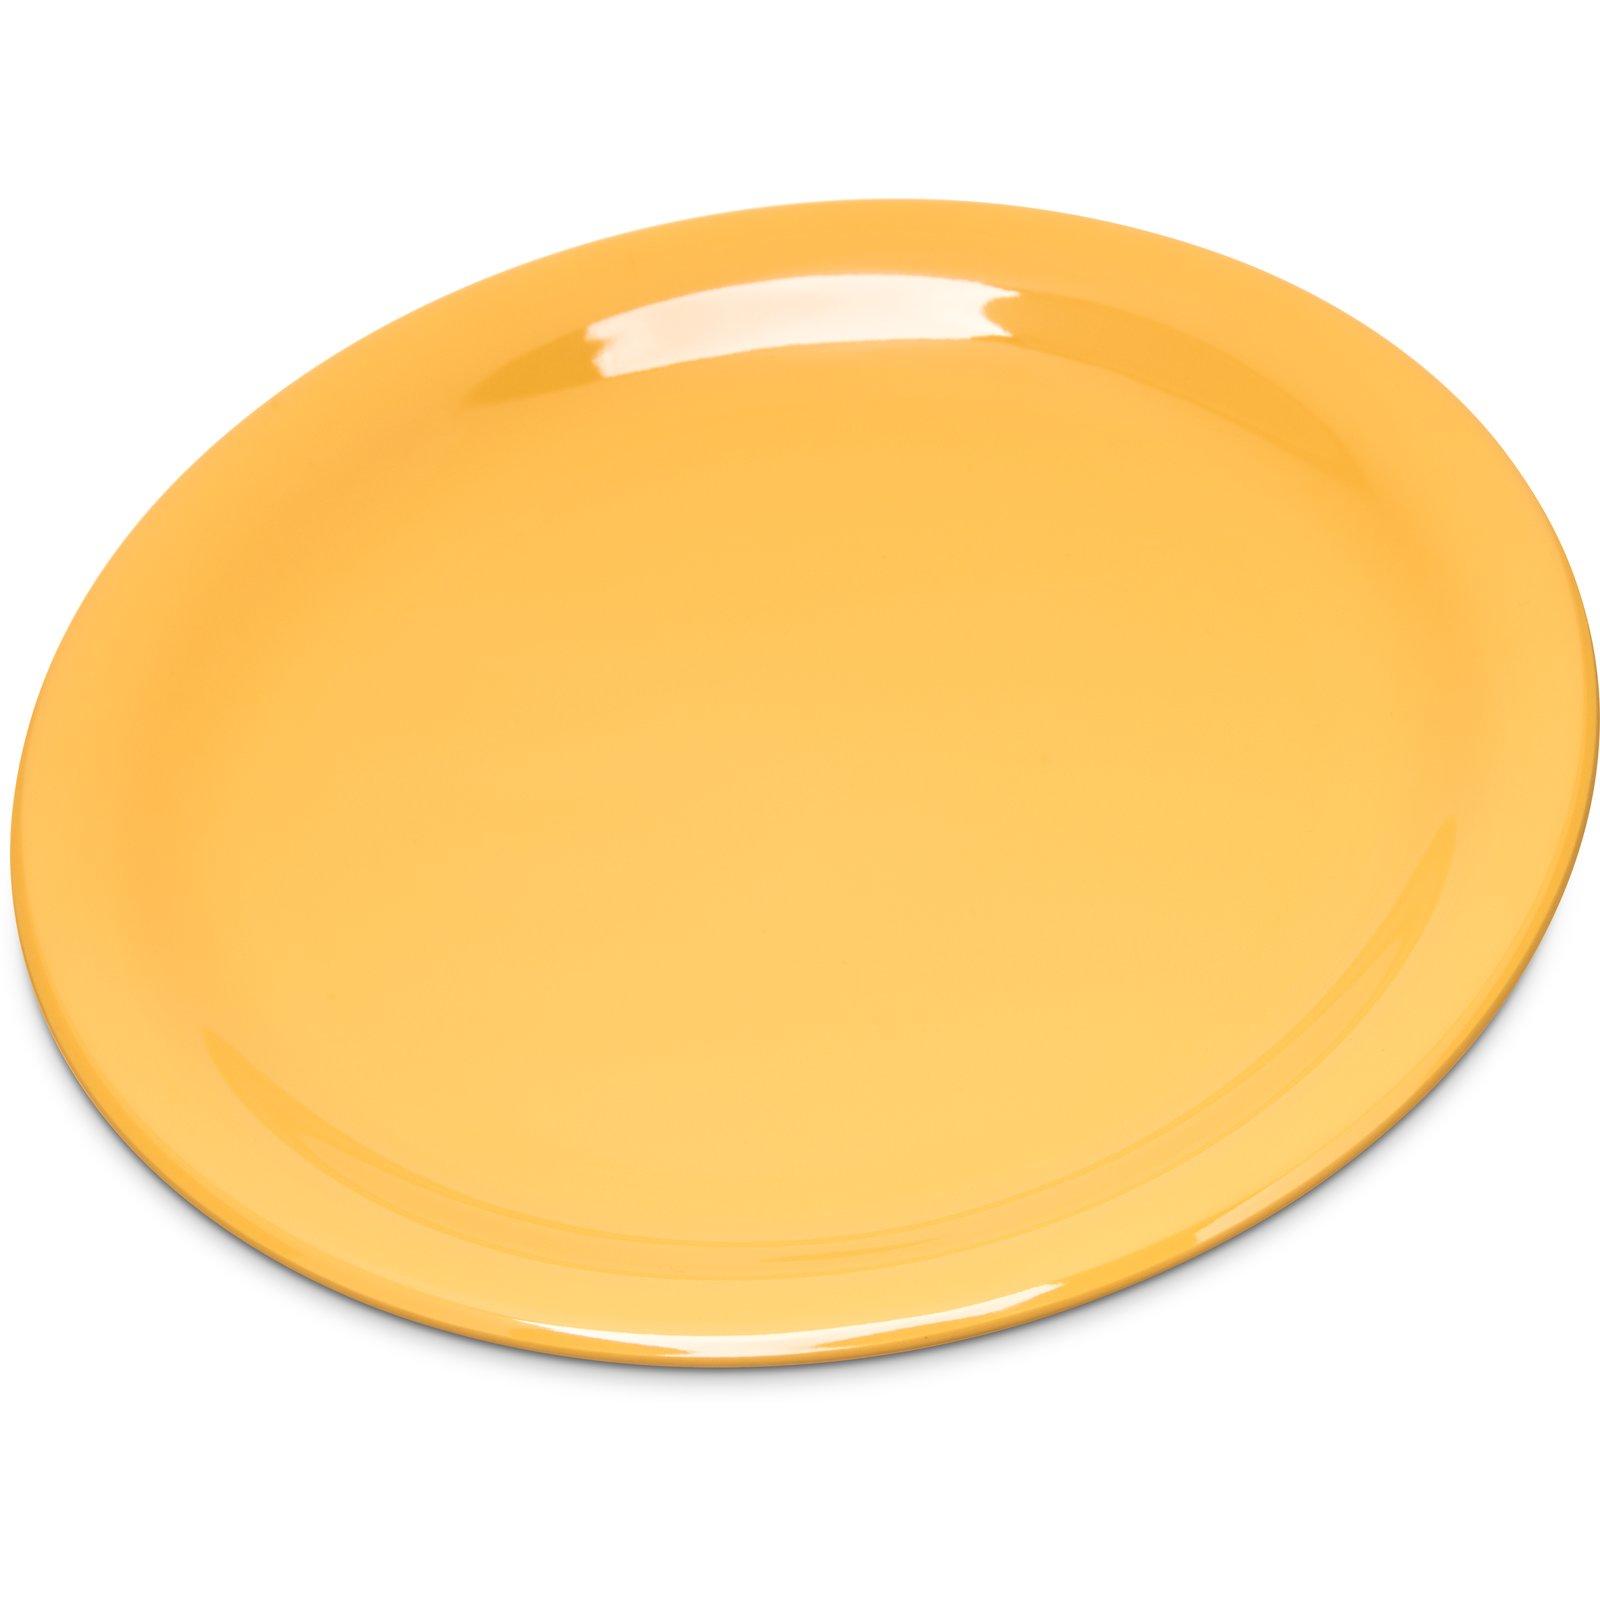 4300622 - Durus® Melamine Salad Plate Narrow Rim 7.25  - Honey Yellow  sc 1 st  Carlisle FoodService Products & 4300622 - Durus® Melamine Salad Plate Narrow Rim 7.25